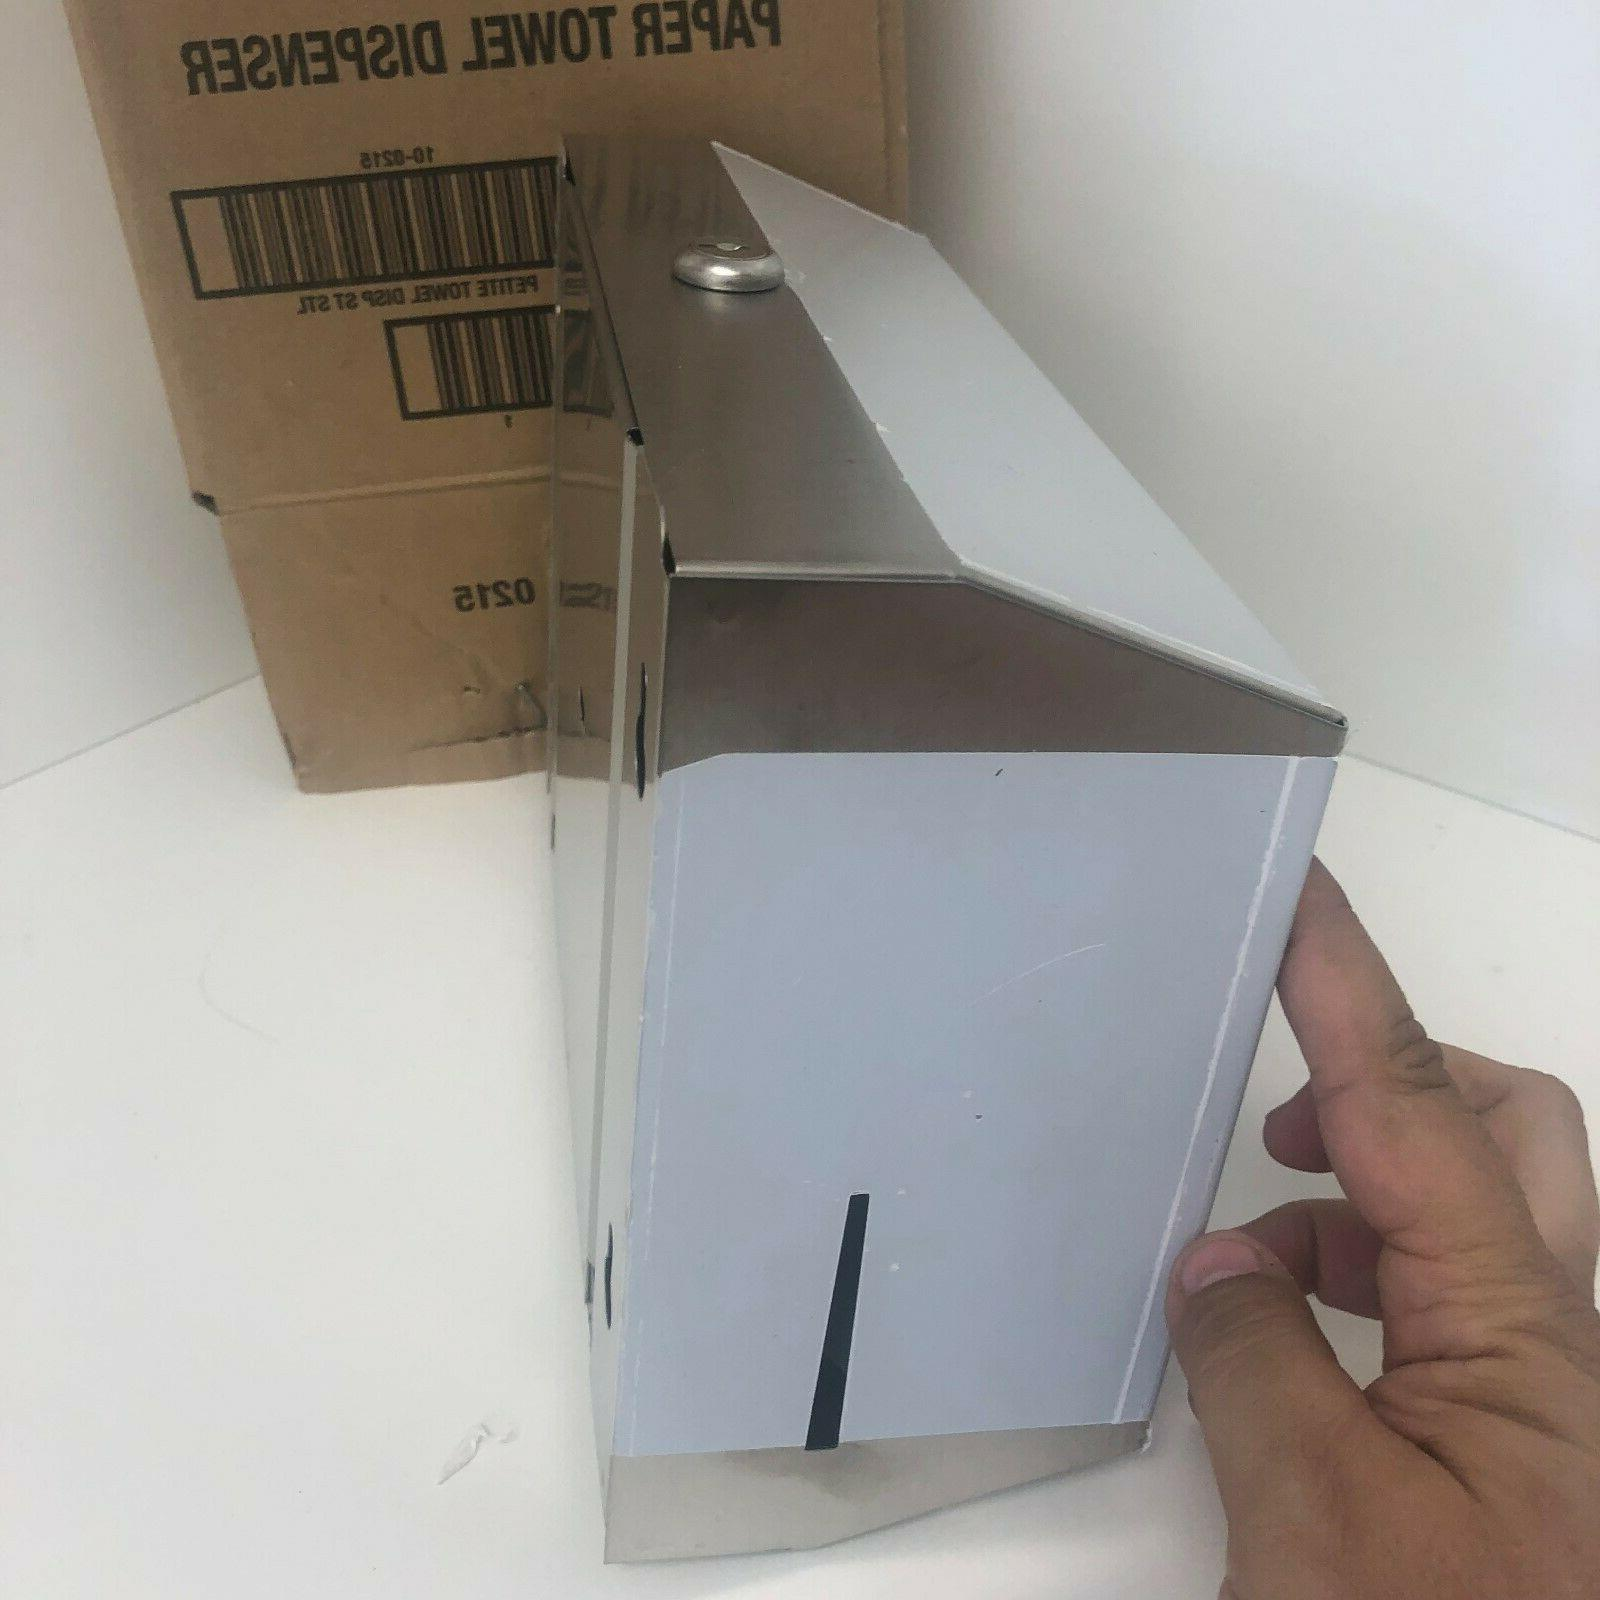 ASI 0215 Dispenser, Mounted, C-Fold or Multi-Fold